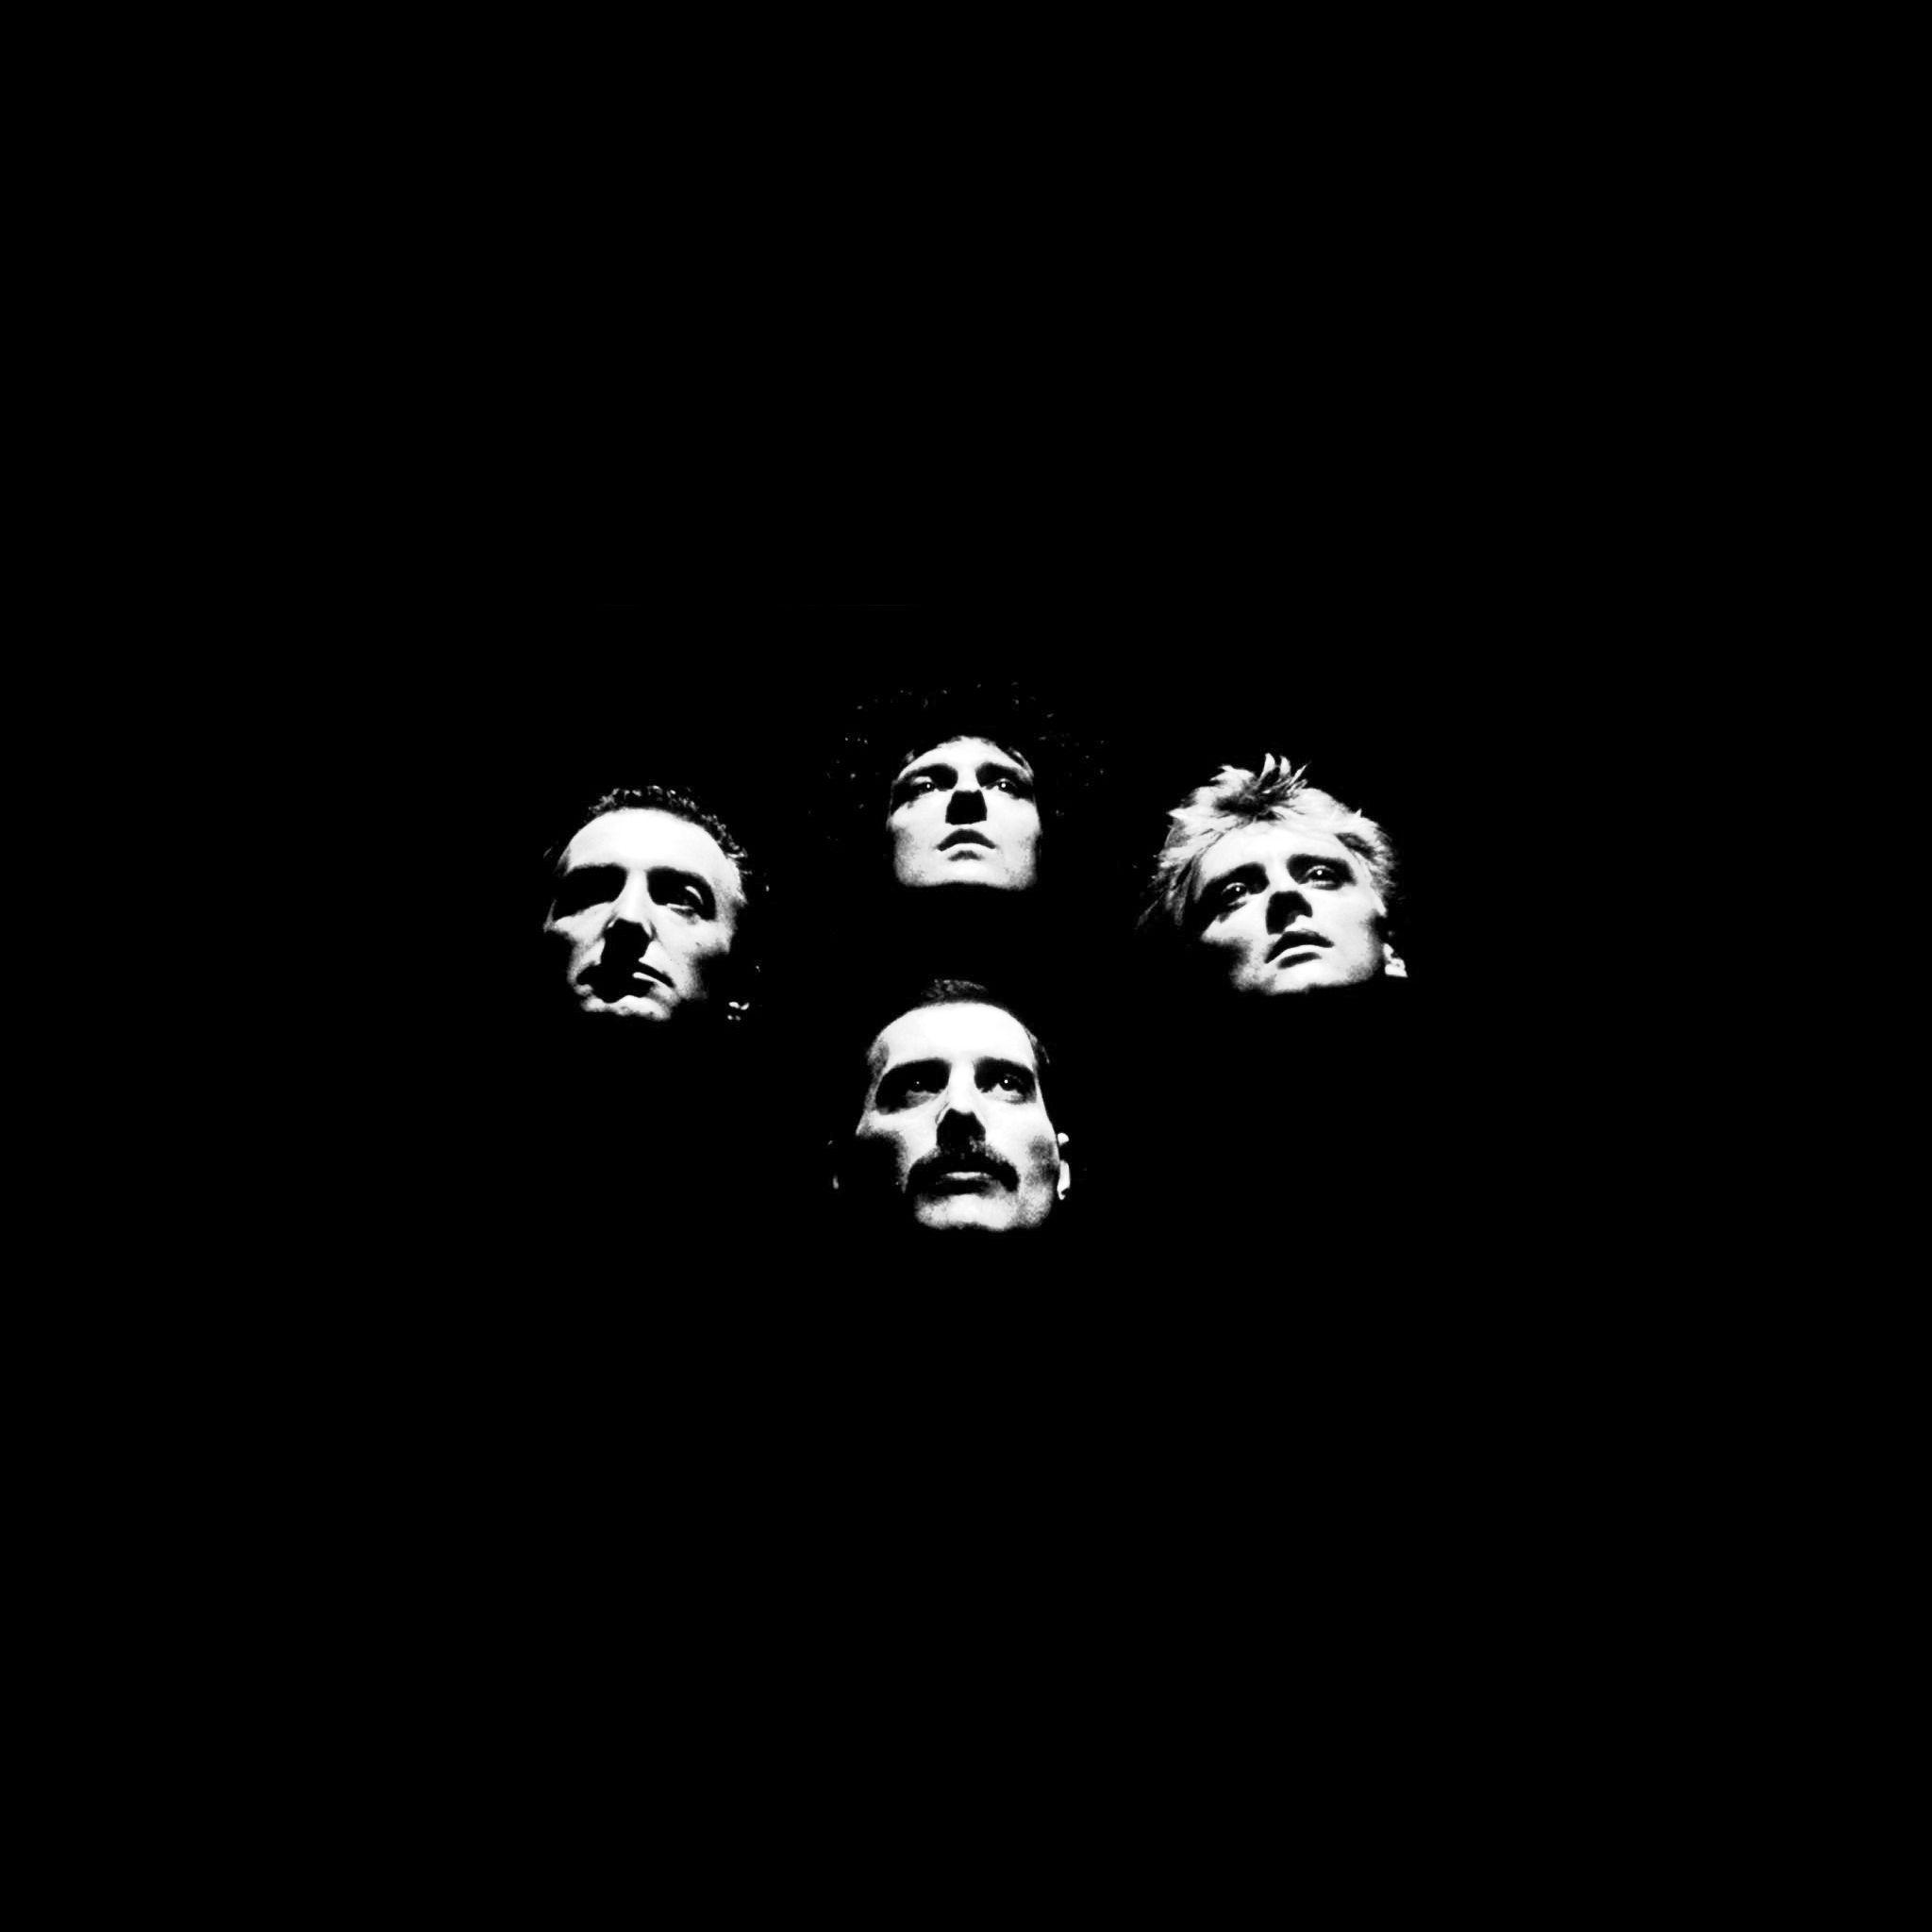 nirvana singers kurt cobain x wallpaper High Quality HD